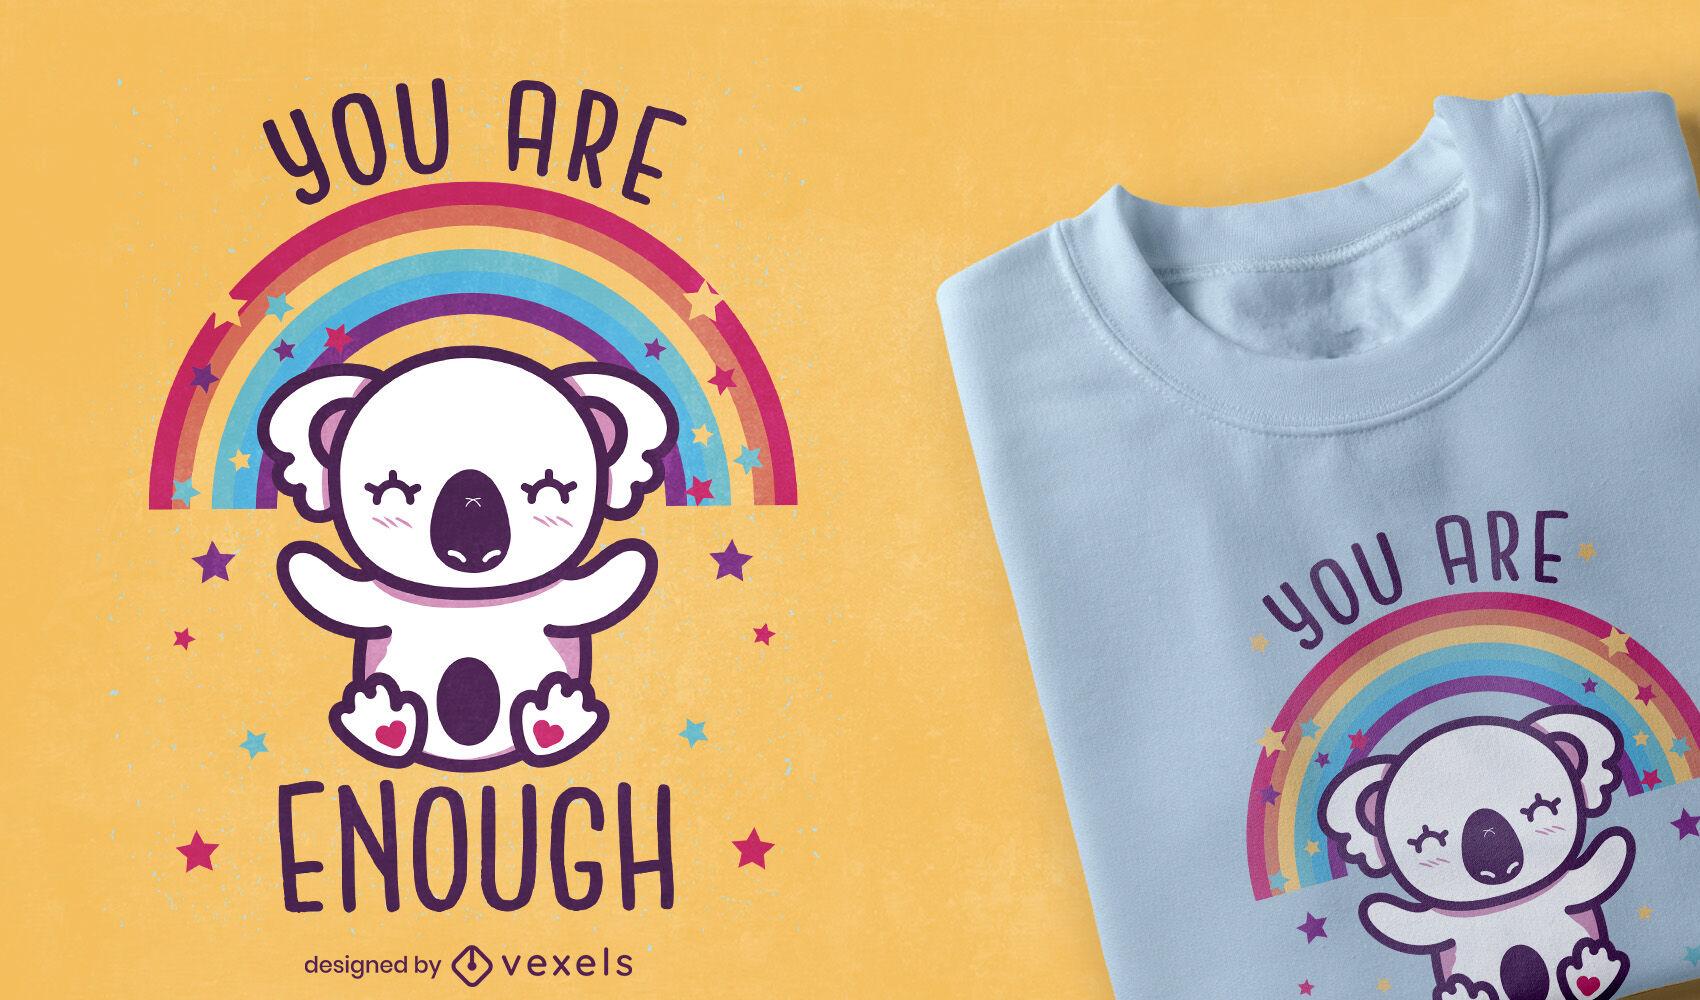 Motivierendes süßes Koala-T-Shirt-Design